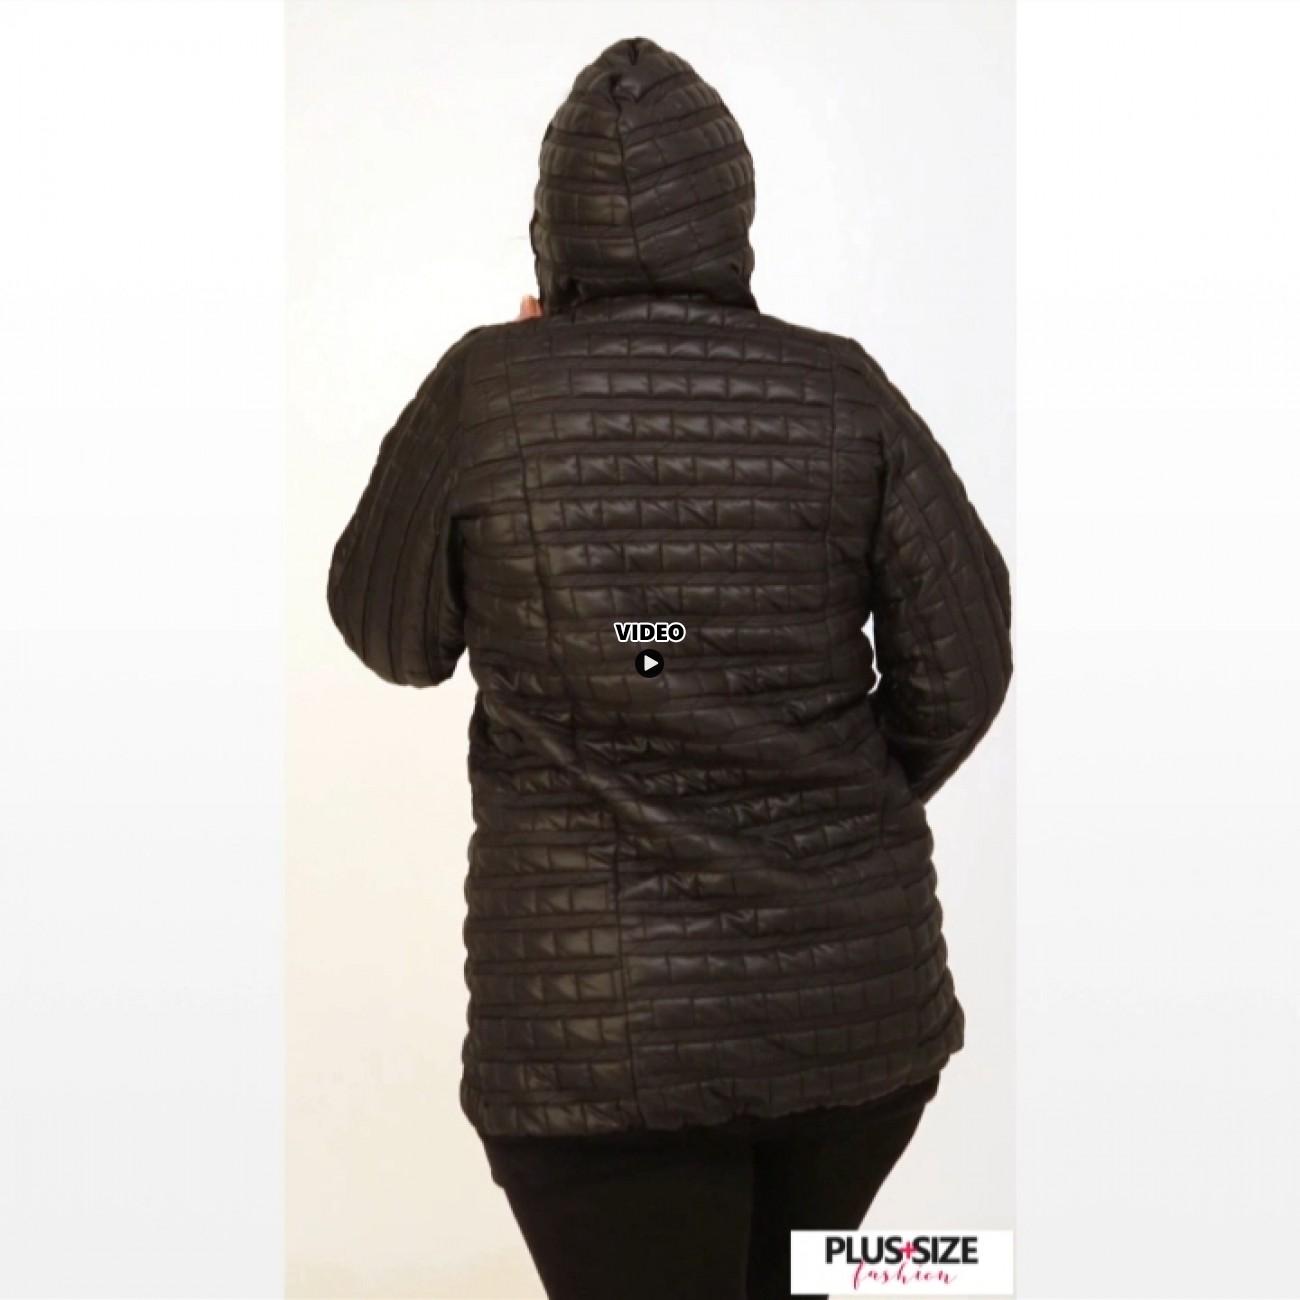 B20-6629 Jacket with hood - Black